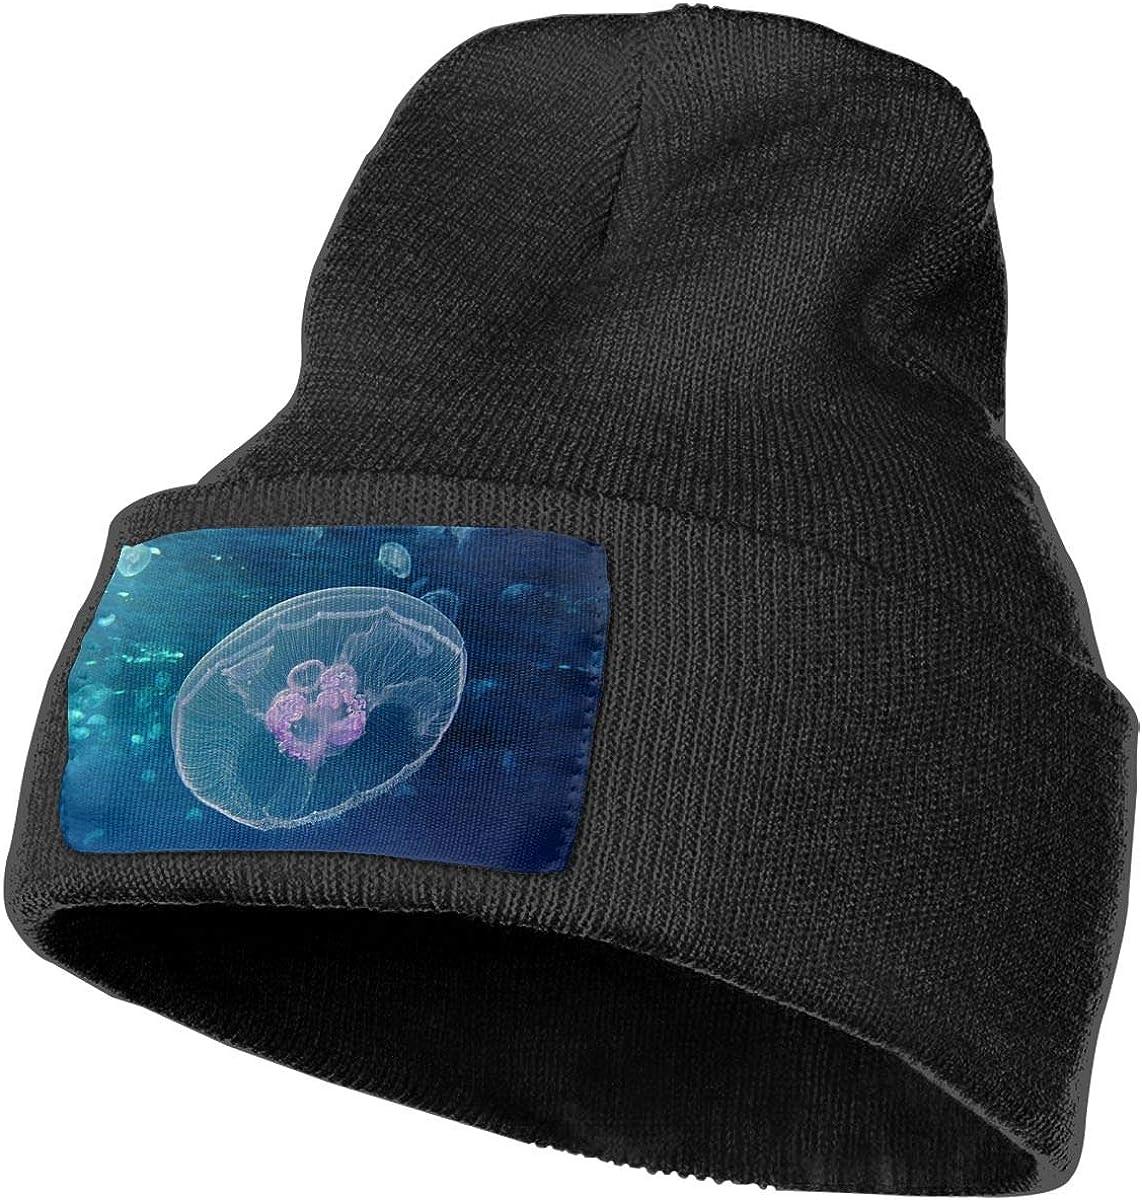 QZqDQ Moon Jellyfish Unisex Fashion Knitted Hat Luxury Hip-Hop Cap